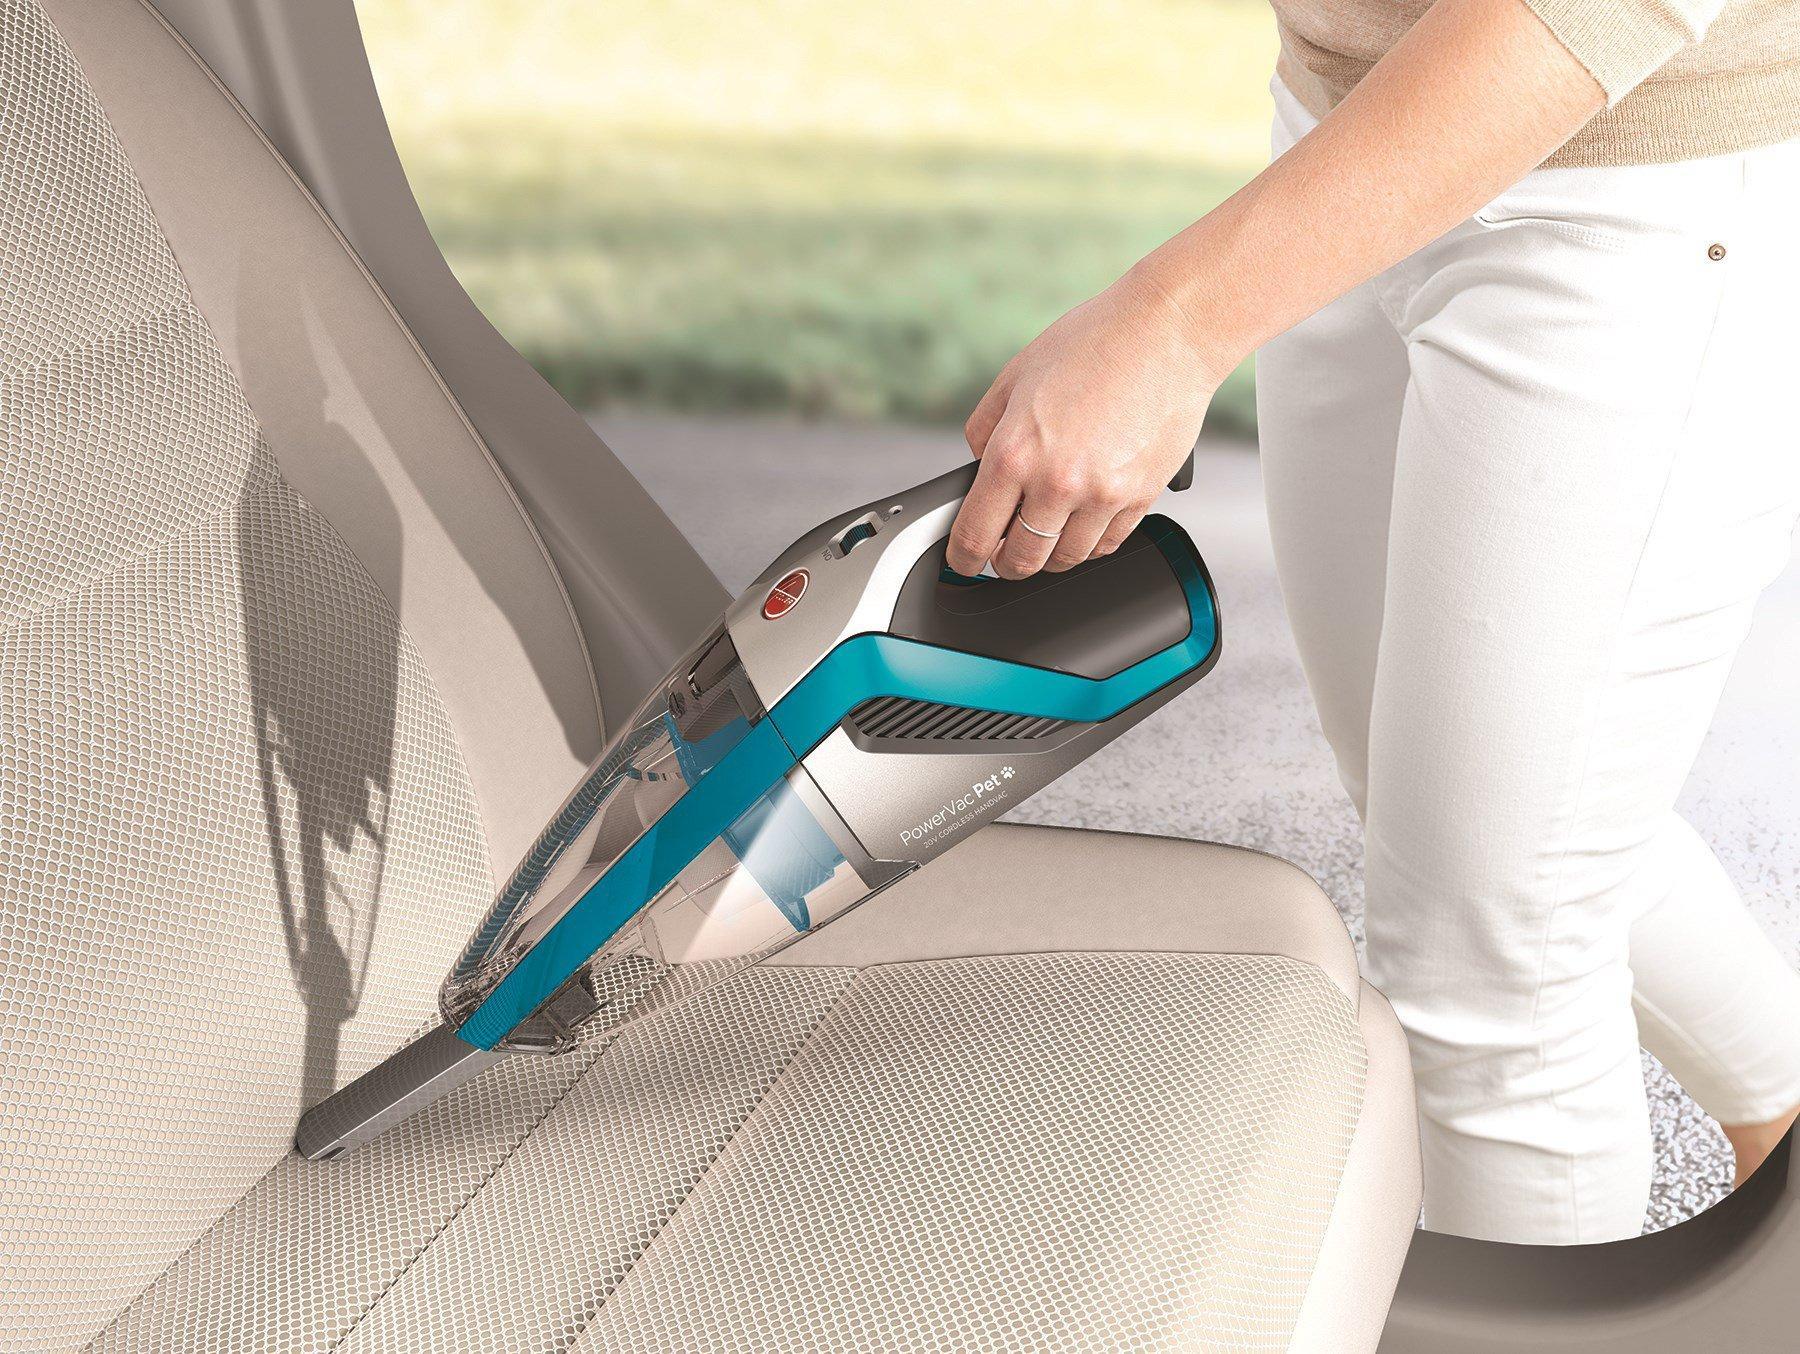 Hoover  PowerVac Pet 20-Volt Cordless Hand Vacuum4